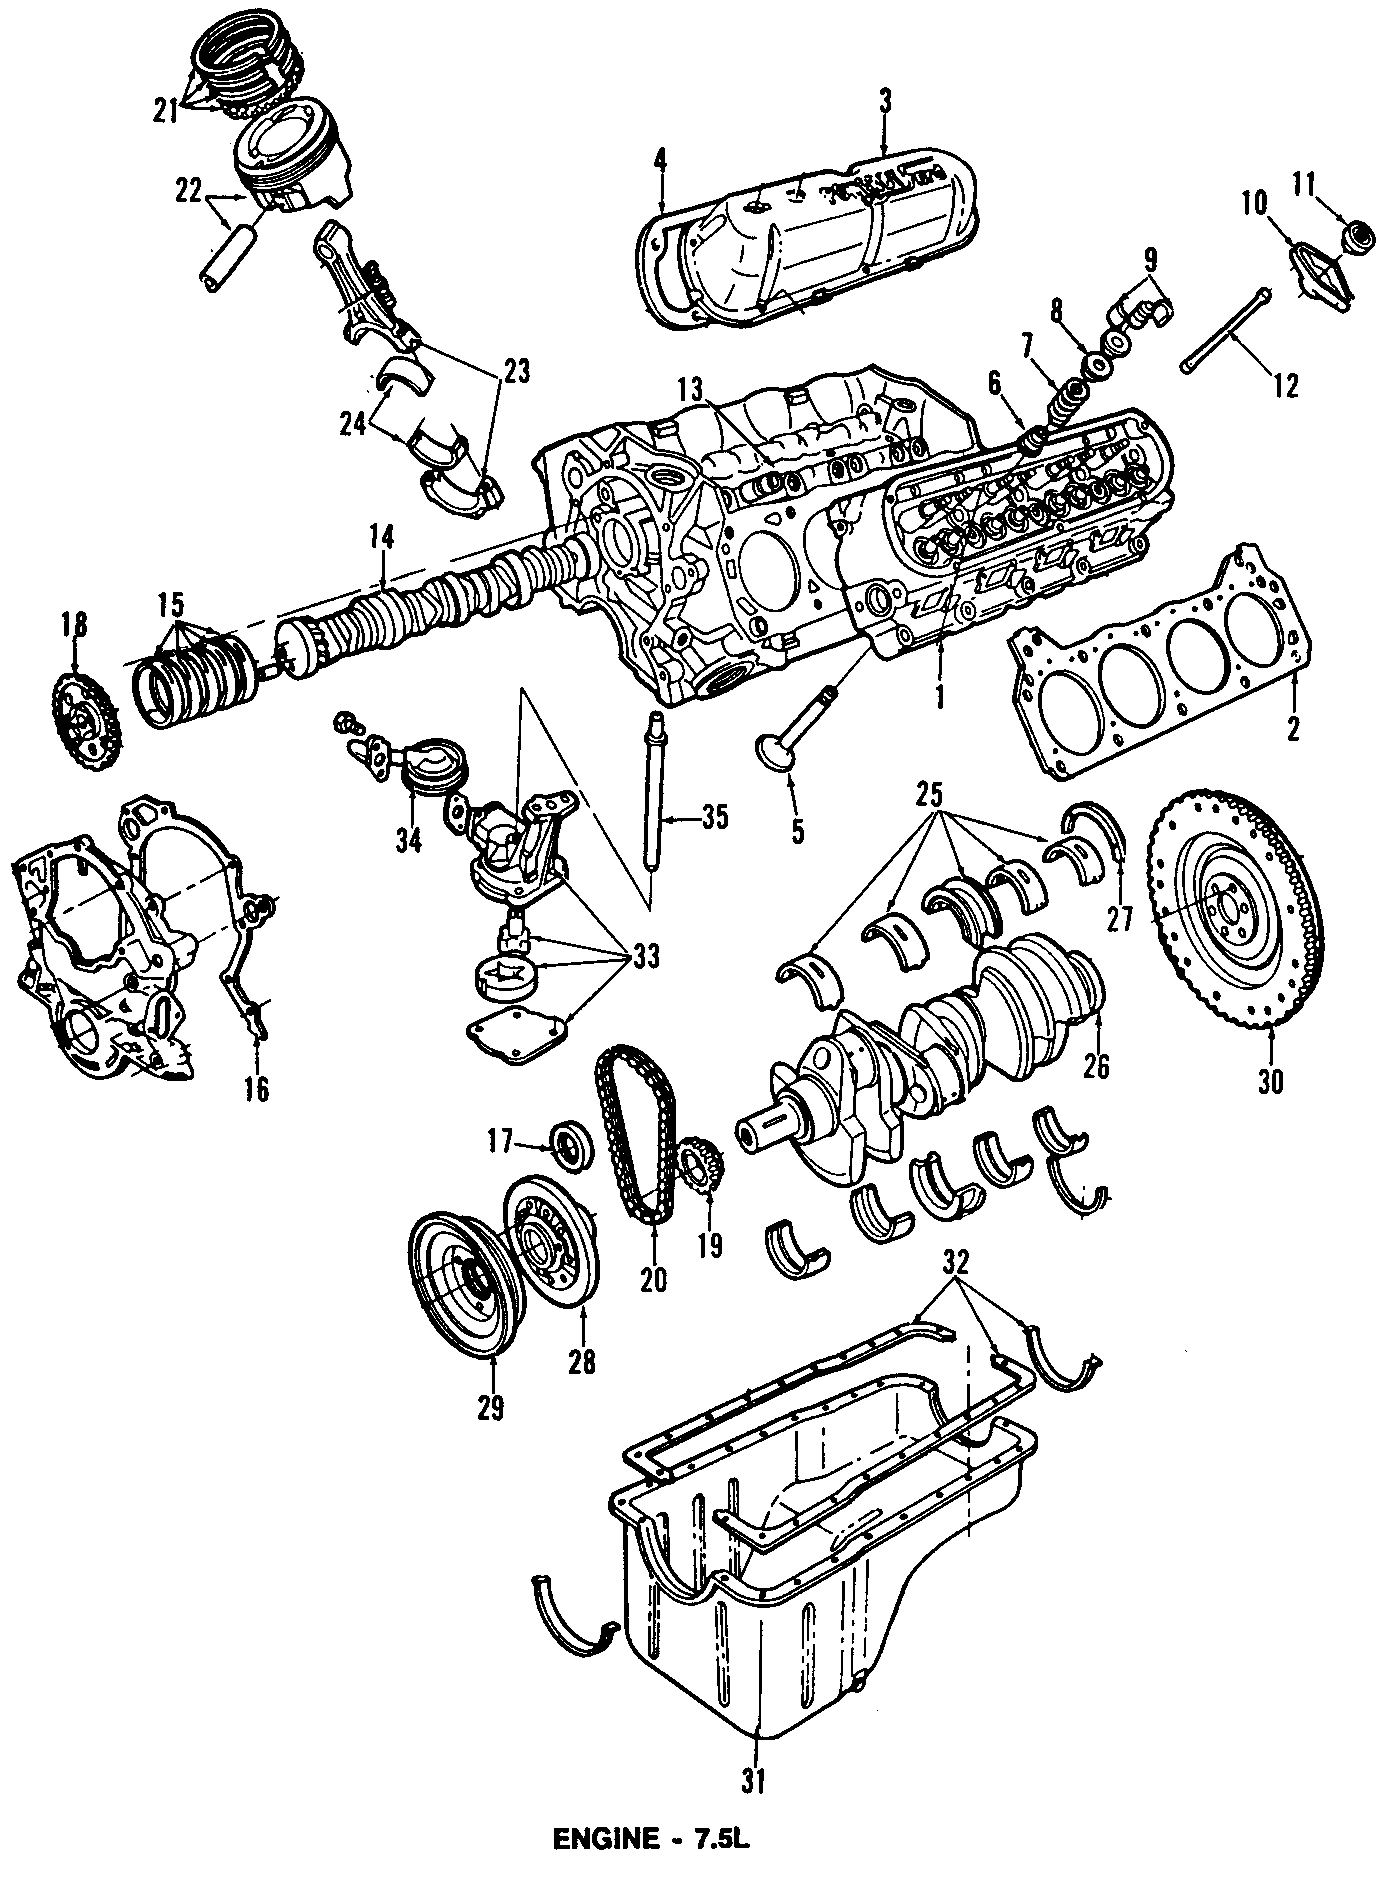 Ford E-350 Econoline Engine Crankshaft Seal (Rear). 7.5